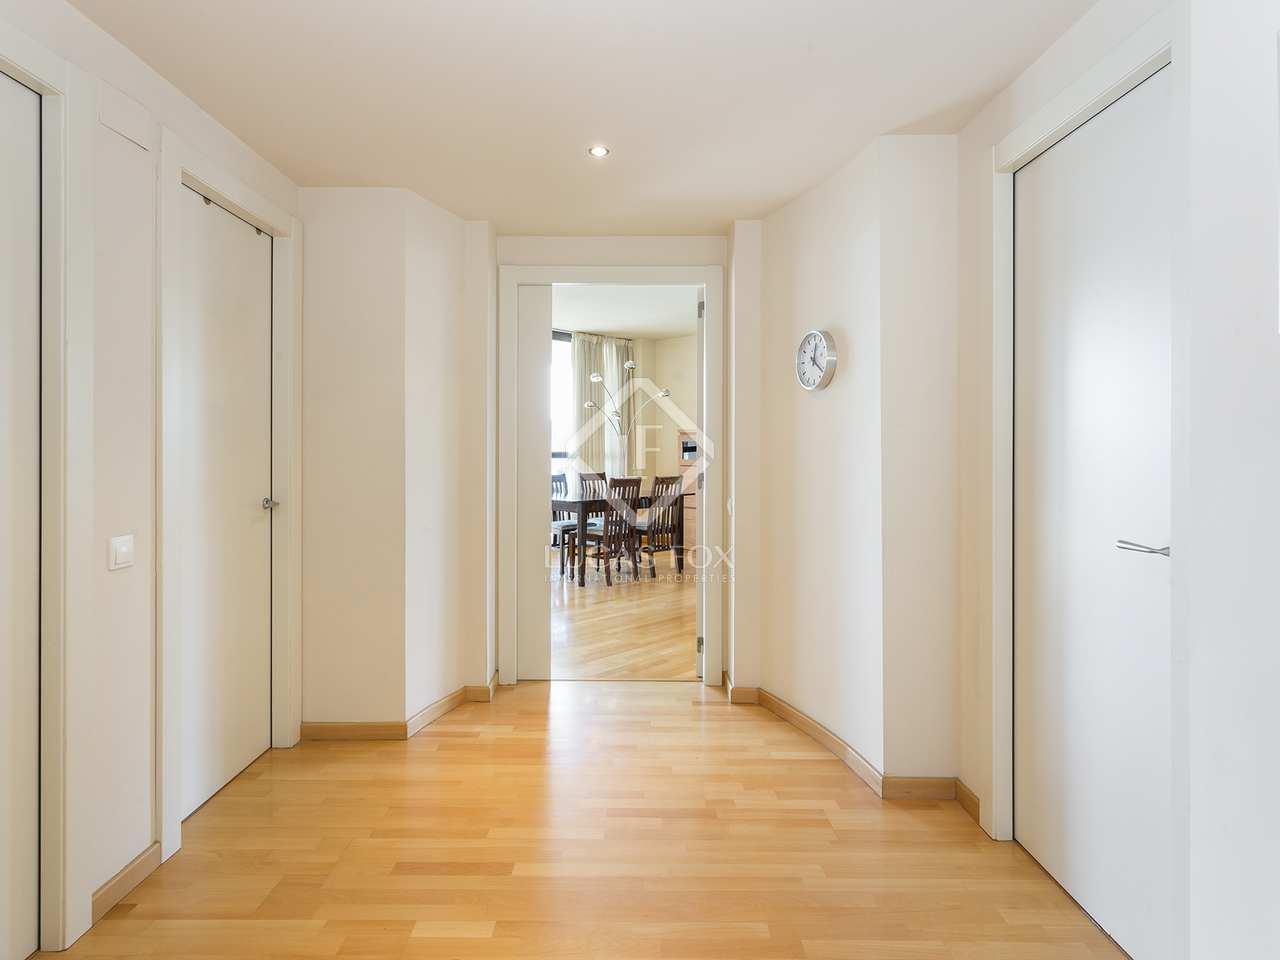 Apartamento de 136m con terraza en alquiler en diagonal mar for Alquiler de dormitorios